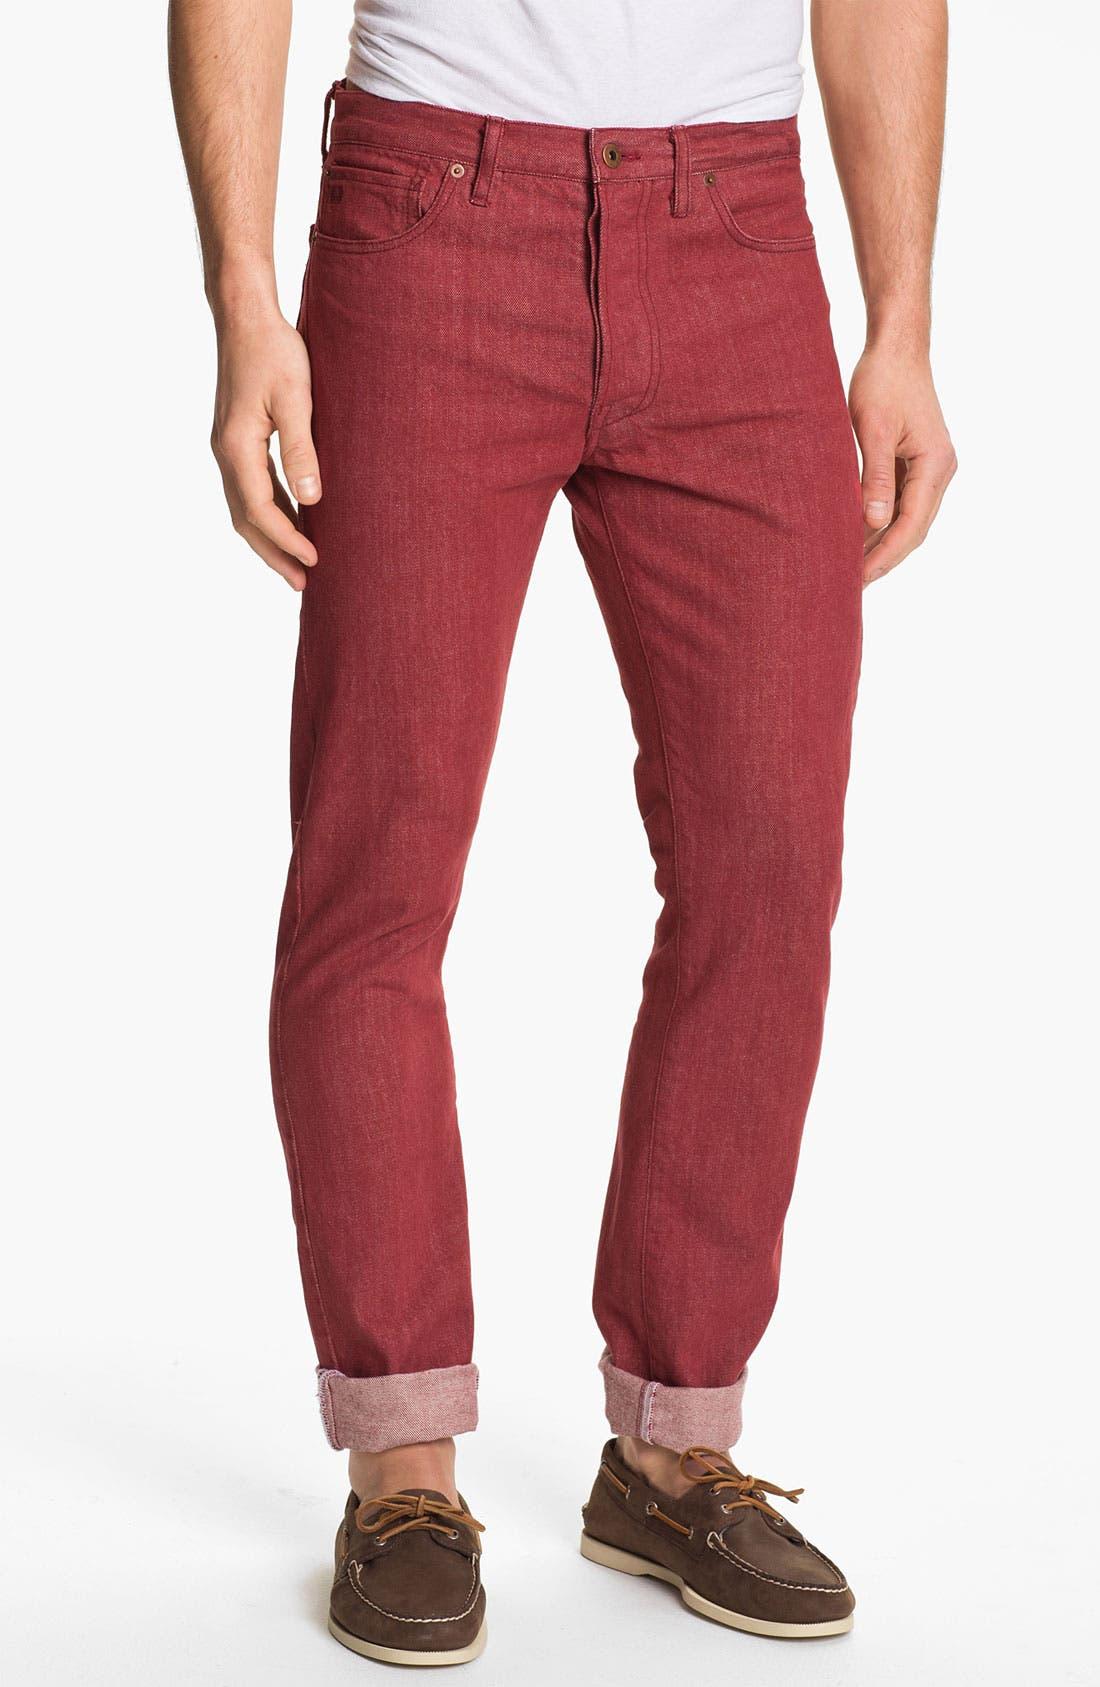 Alternate Image 2  - J. Press York Street 'Hanover' Slim Fit Selvedge Jeans